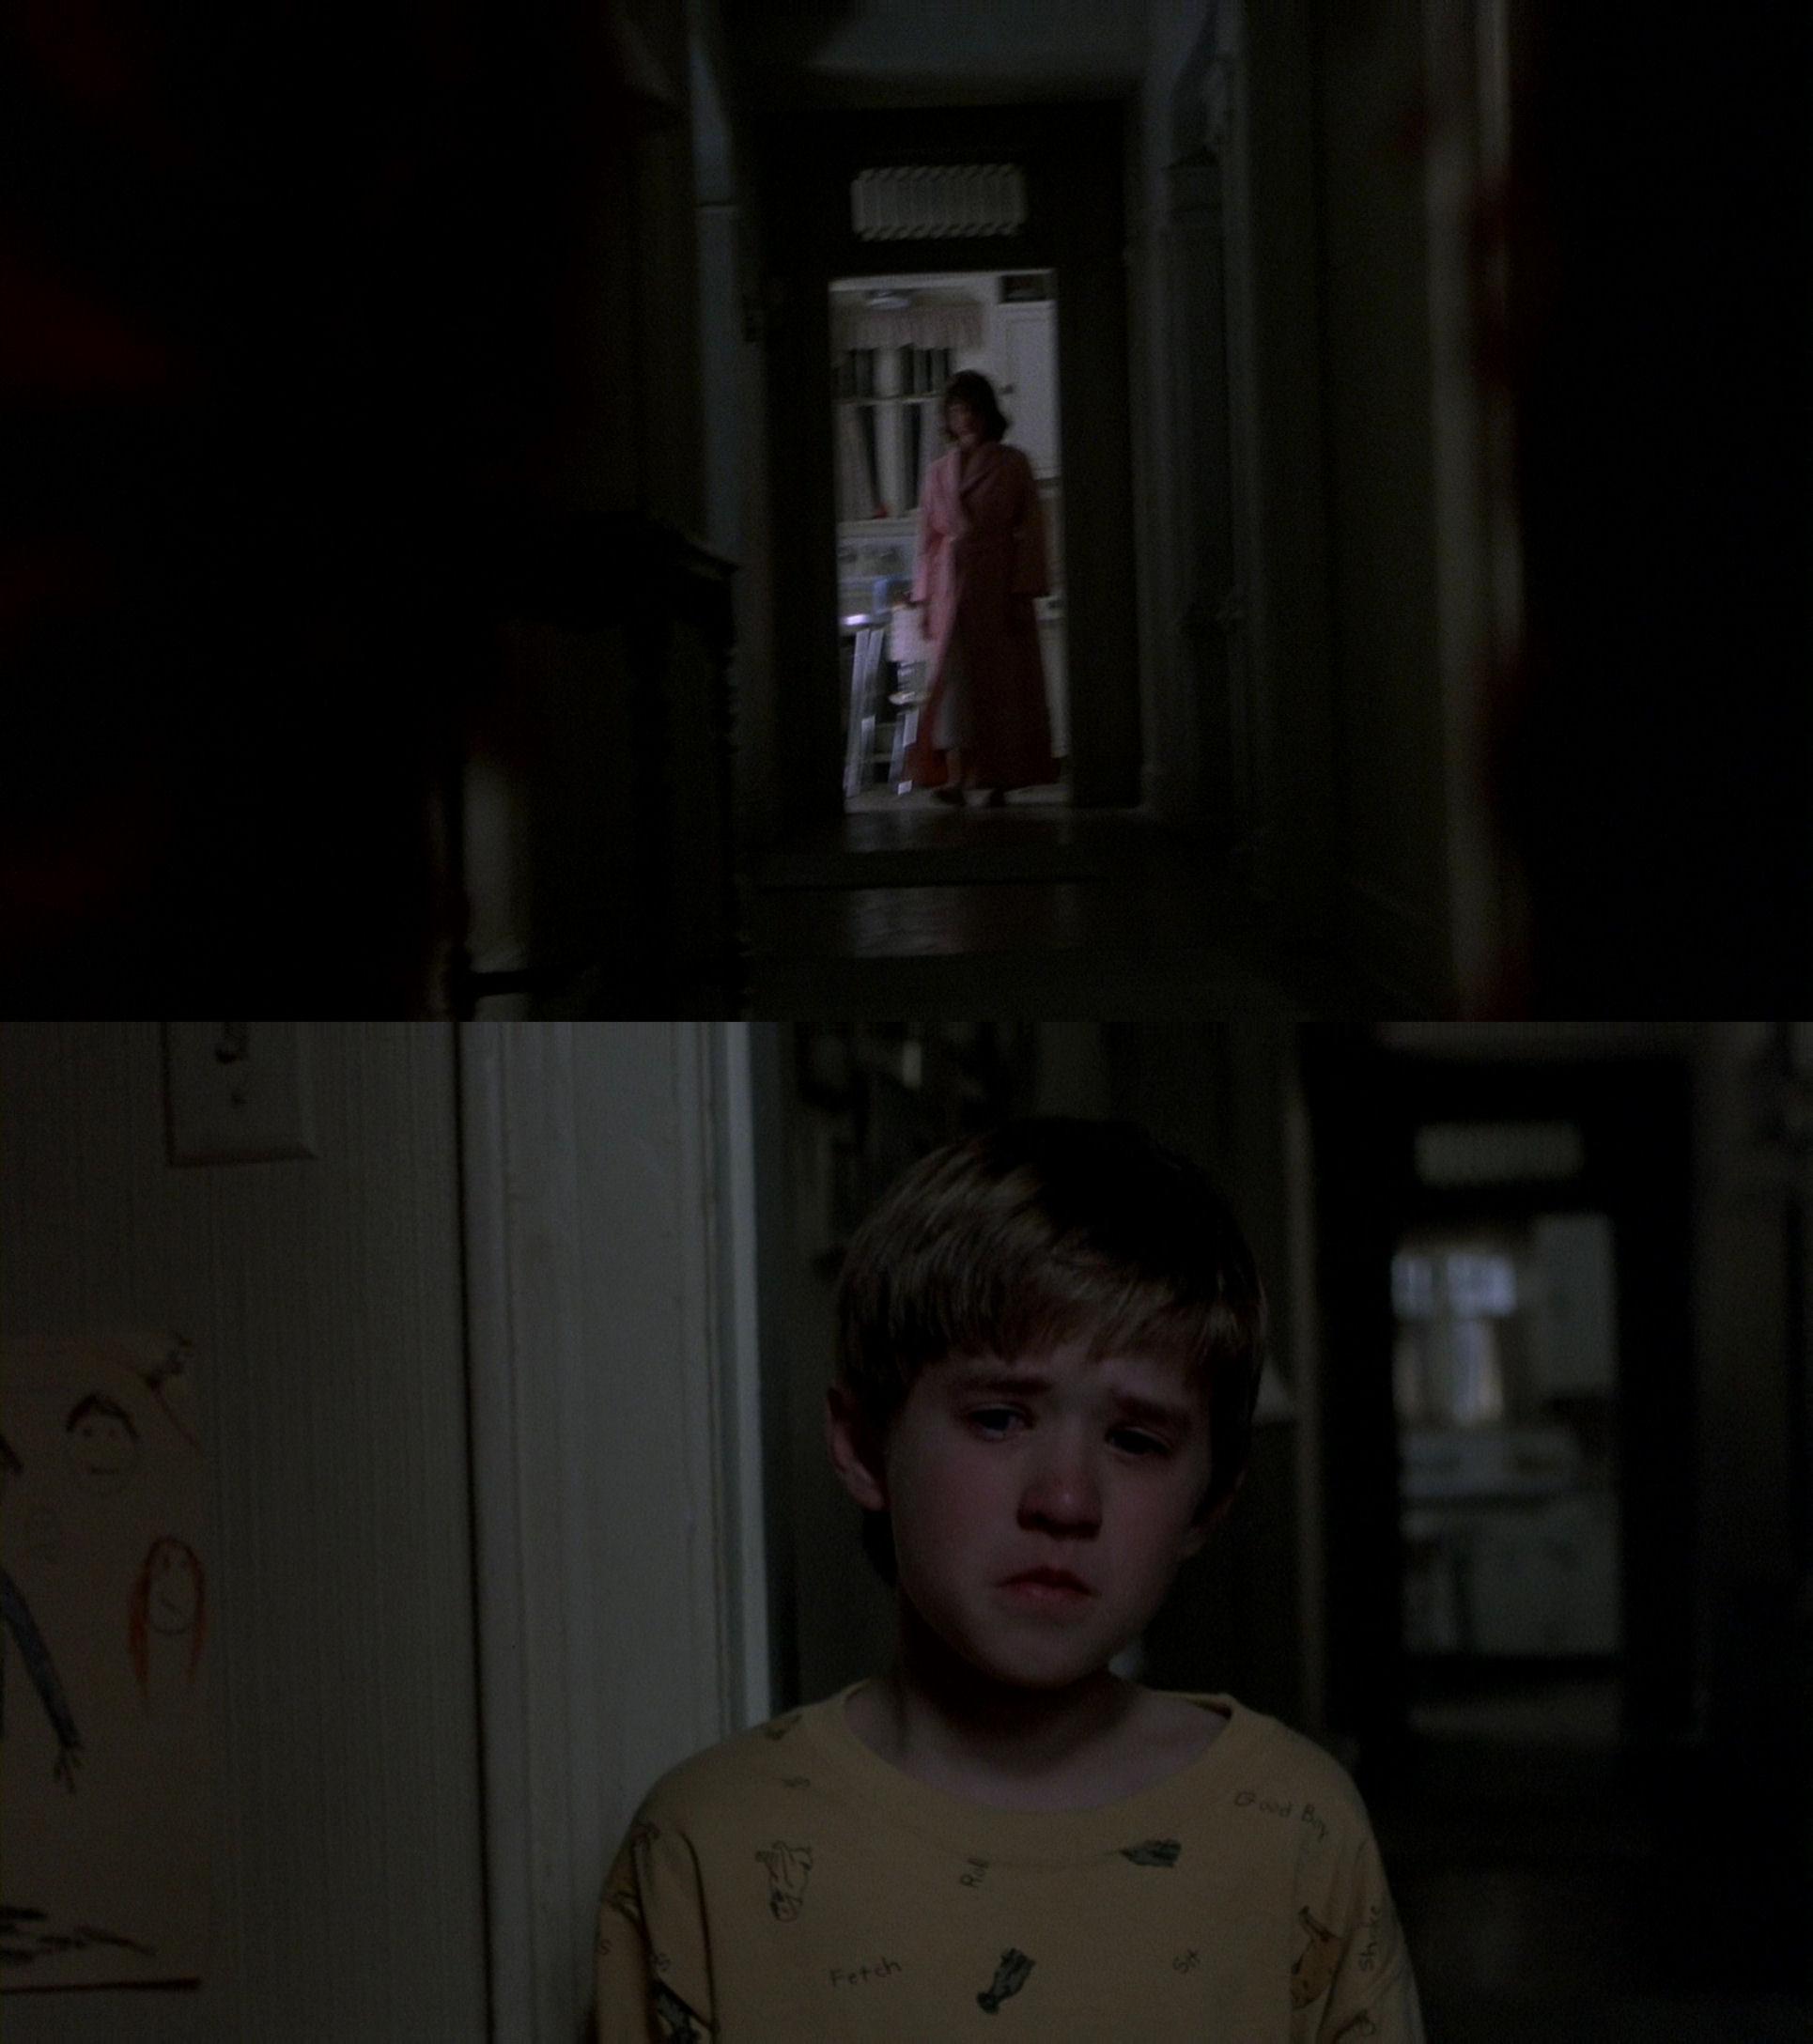 The Sixth Sense Hanging Ghosts The Sixth Sense, Part ...